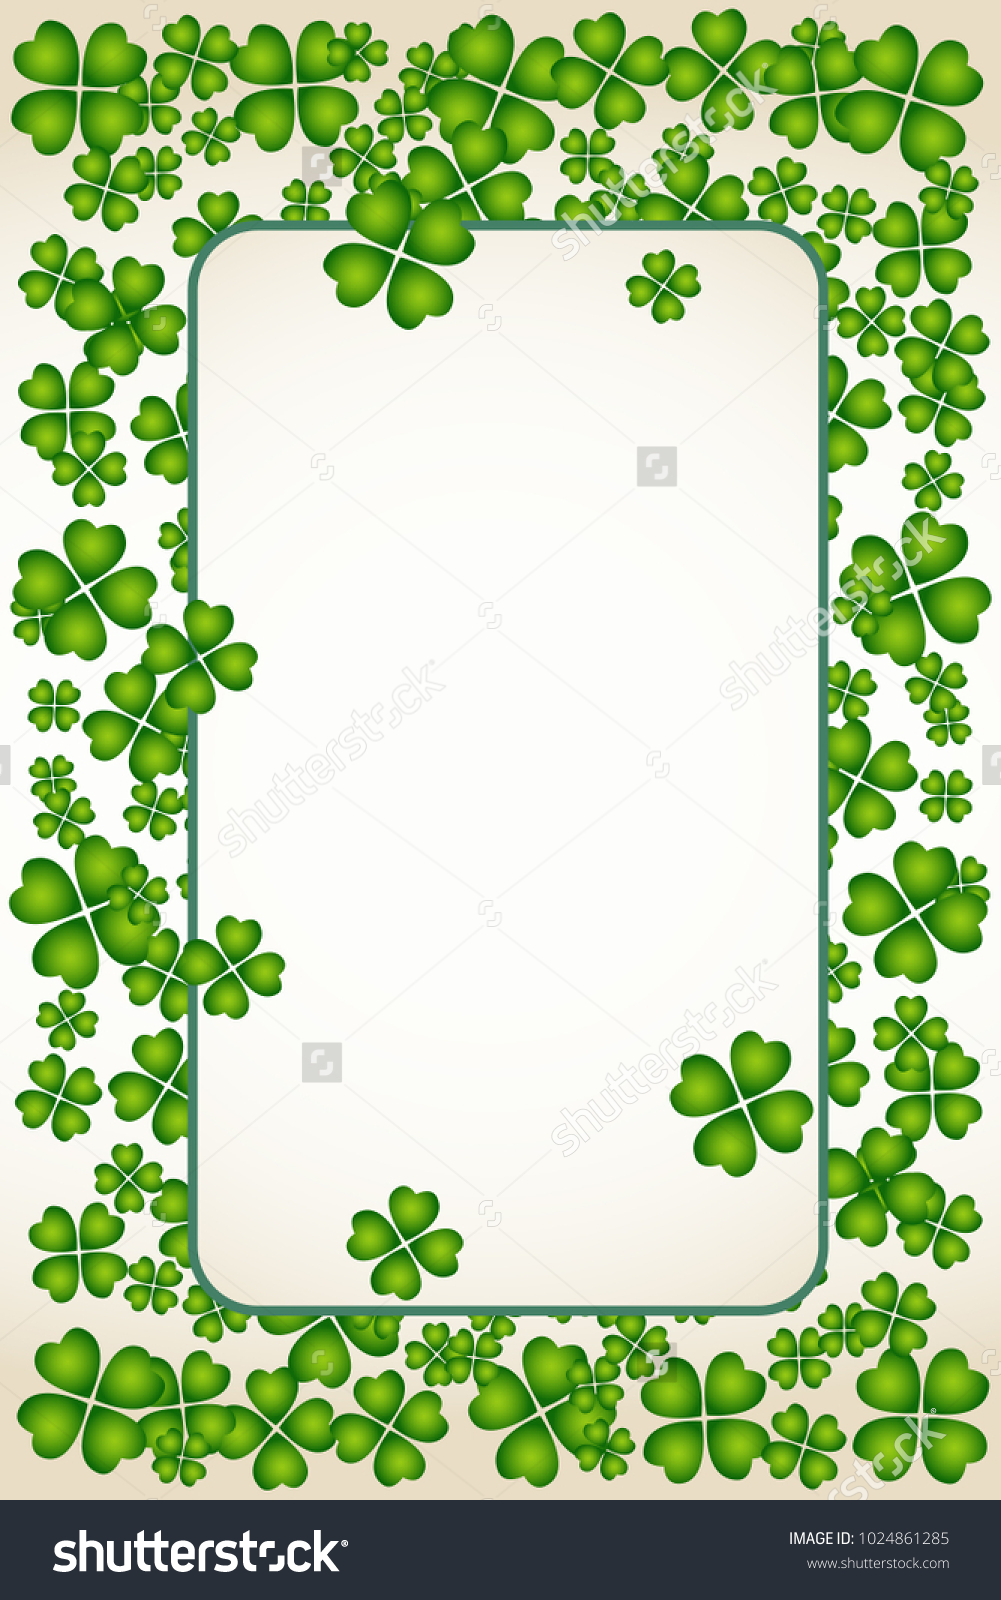 Saint patricks day vector frame small stock vector 1024861285 saint patricks day vector frame with small green trefoil clover shamrock leaves irish festival celebration biocorpaavc Gallery